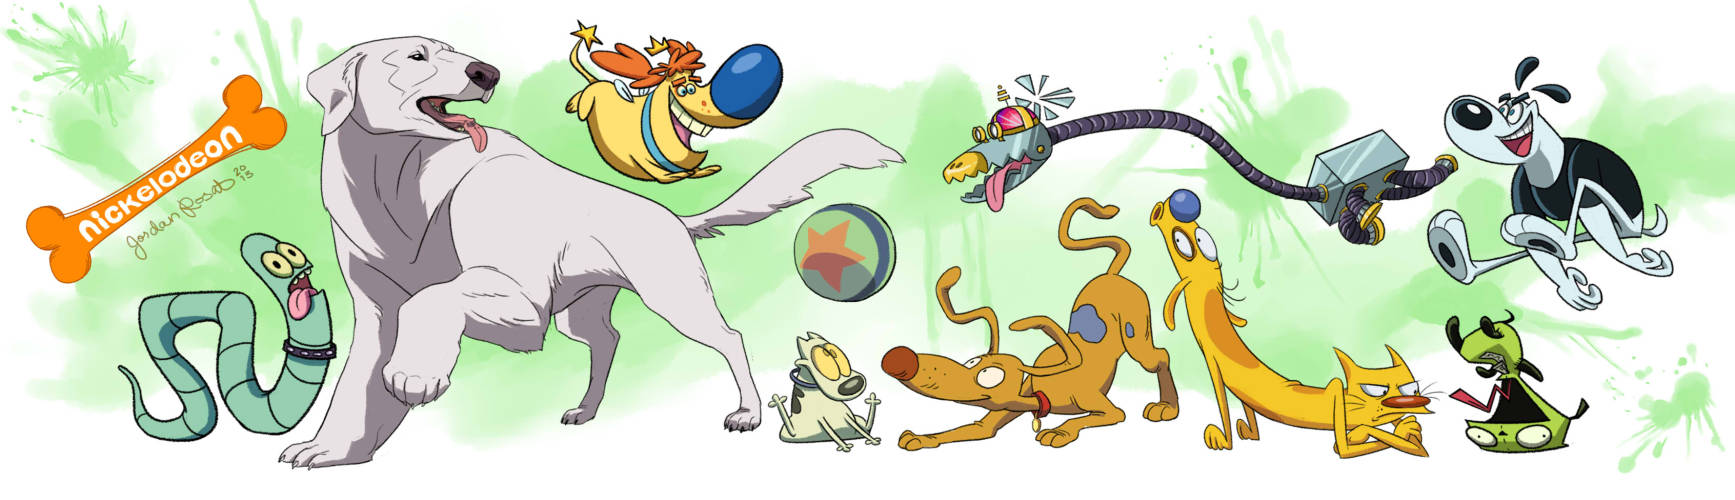 Category:Dogs | Nickelodeon | FANDOM powered by Wikia